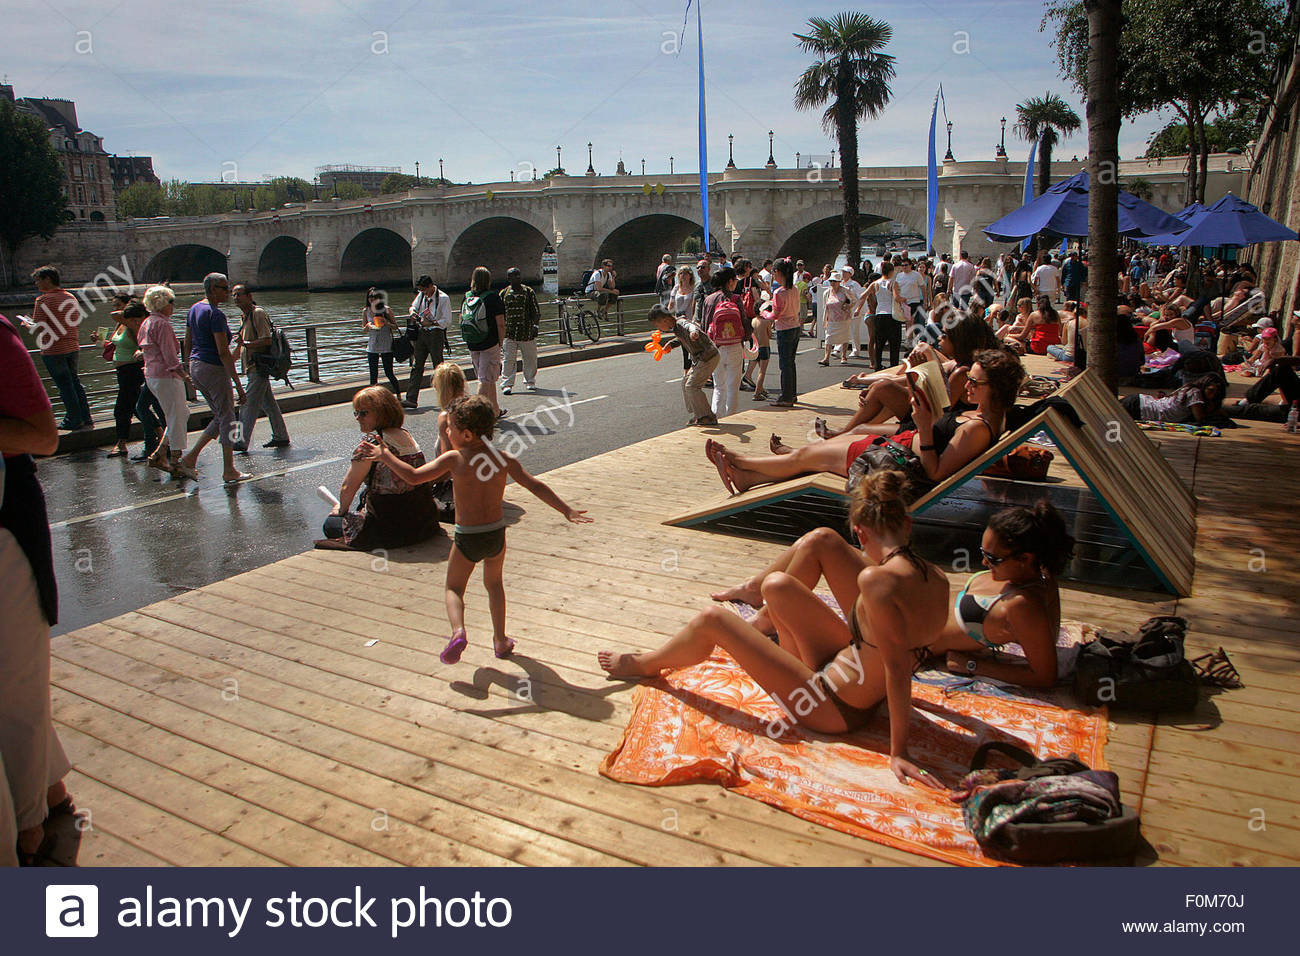 People relaxing and walking along Seine river, Paris Plage, Paris. - Stock Image